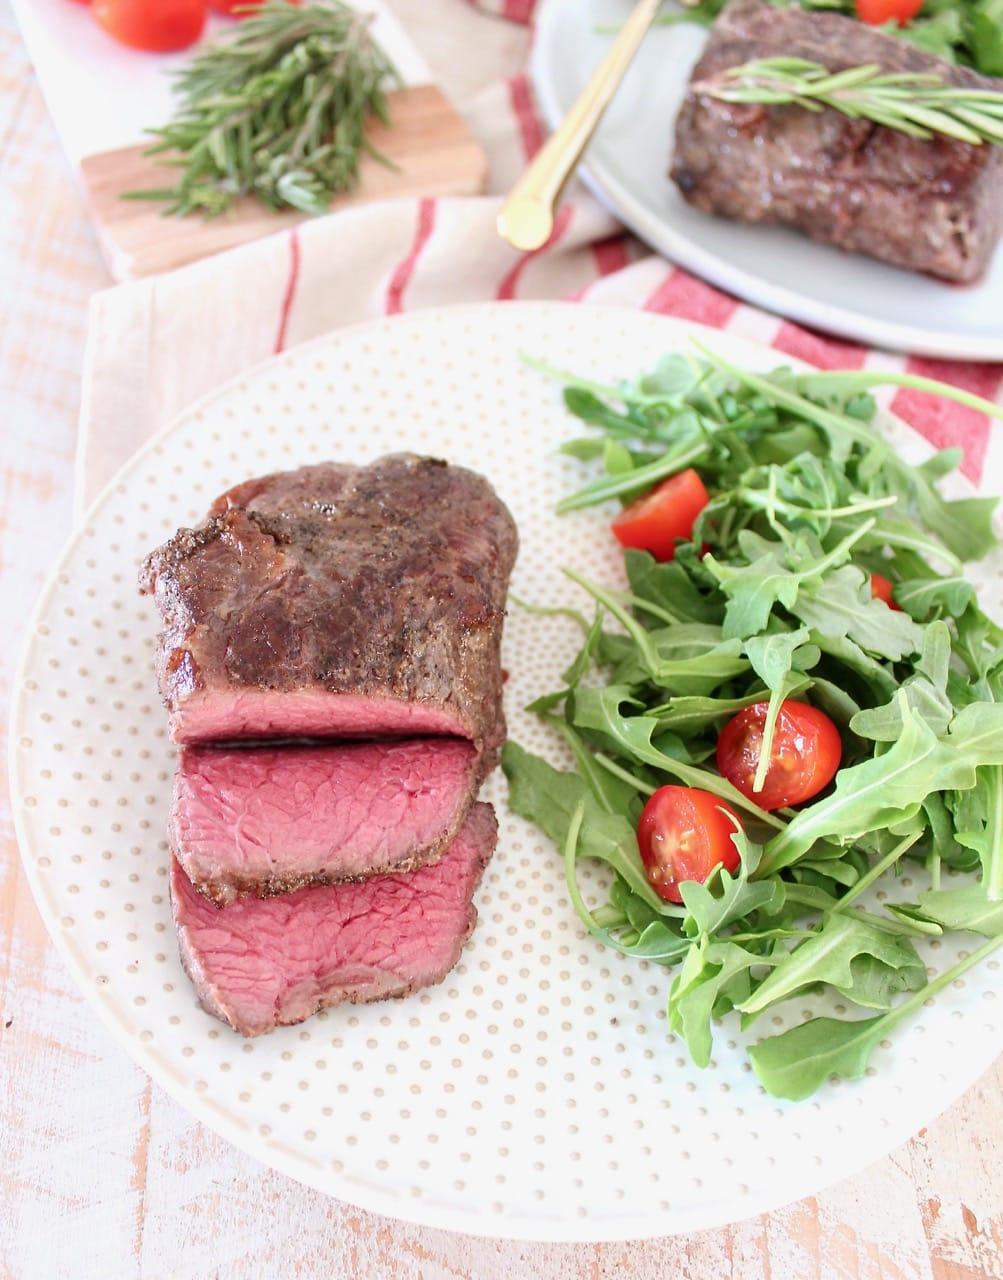 Medium Rare Sous Vide Sirloin Steak with Arugula Tomato Salad